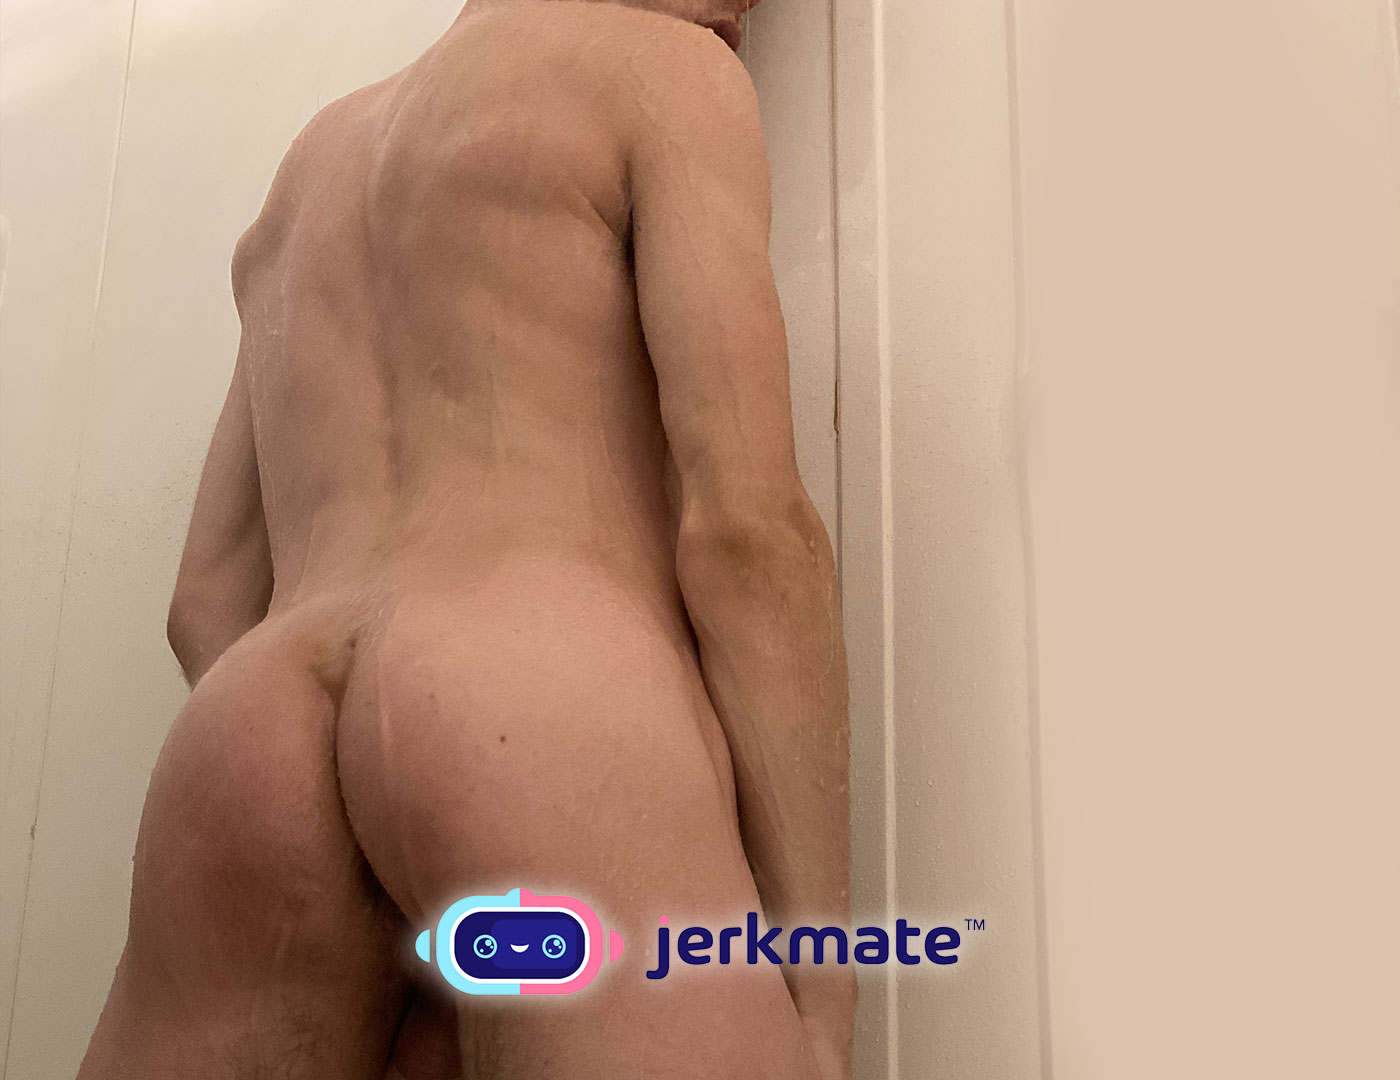 Edward Terrant Porn Picture - Jerkmate